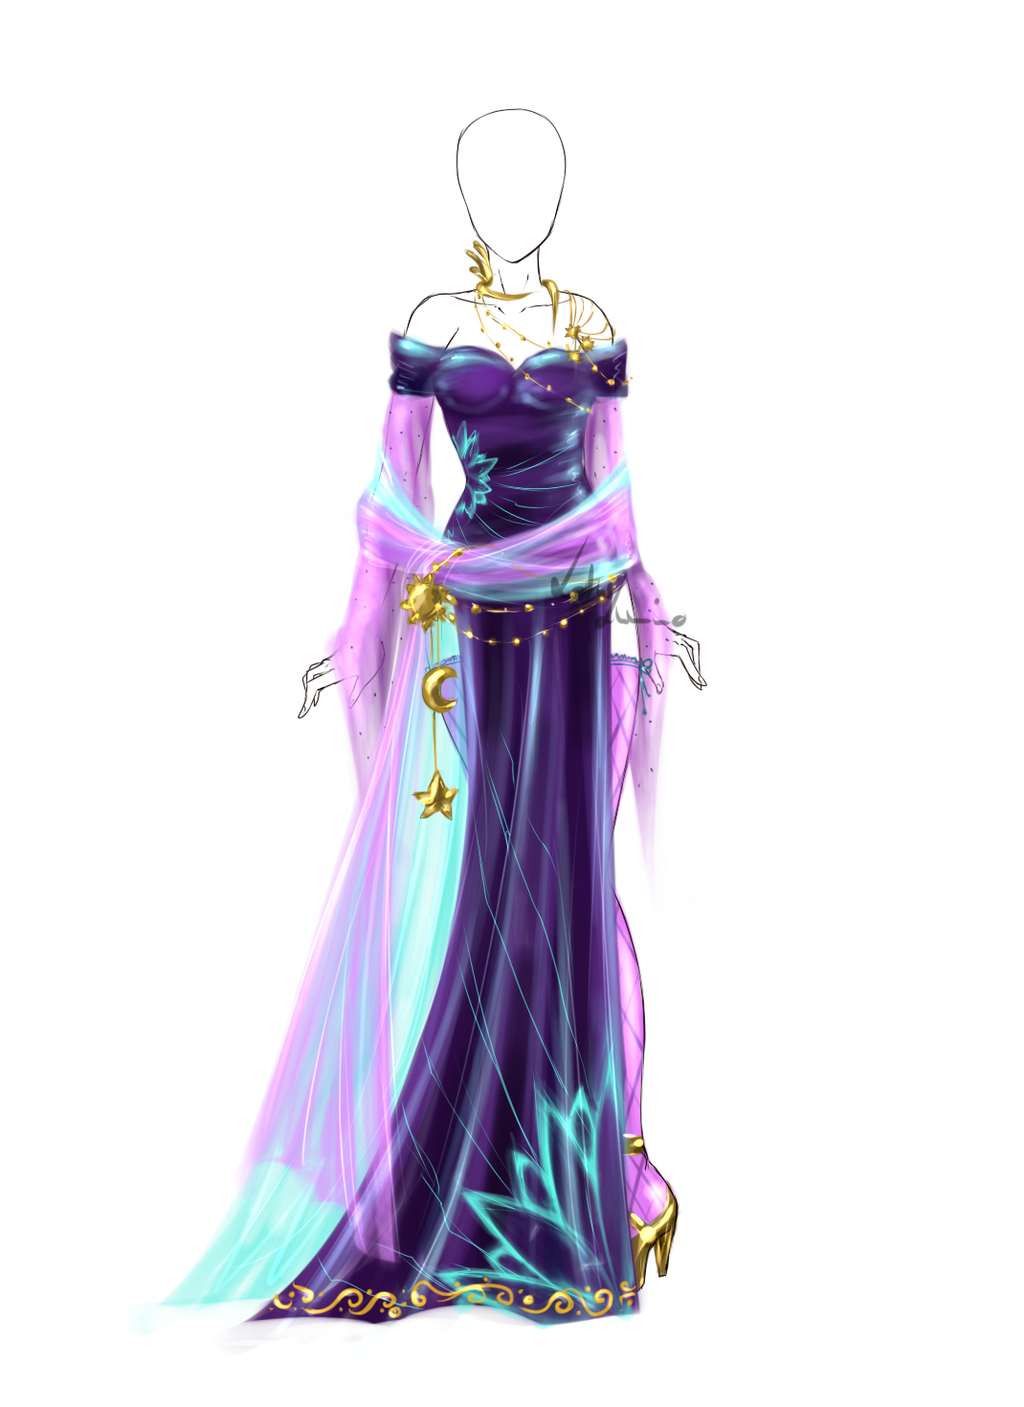 Outfit+design+-+57+-+closed+by+LotusLumino.deviantart.com ...